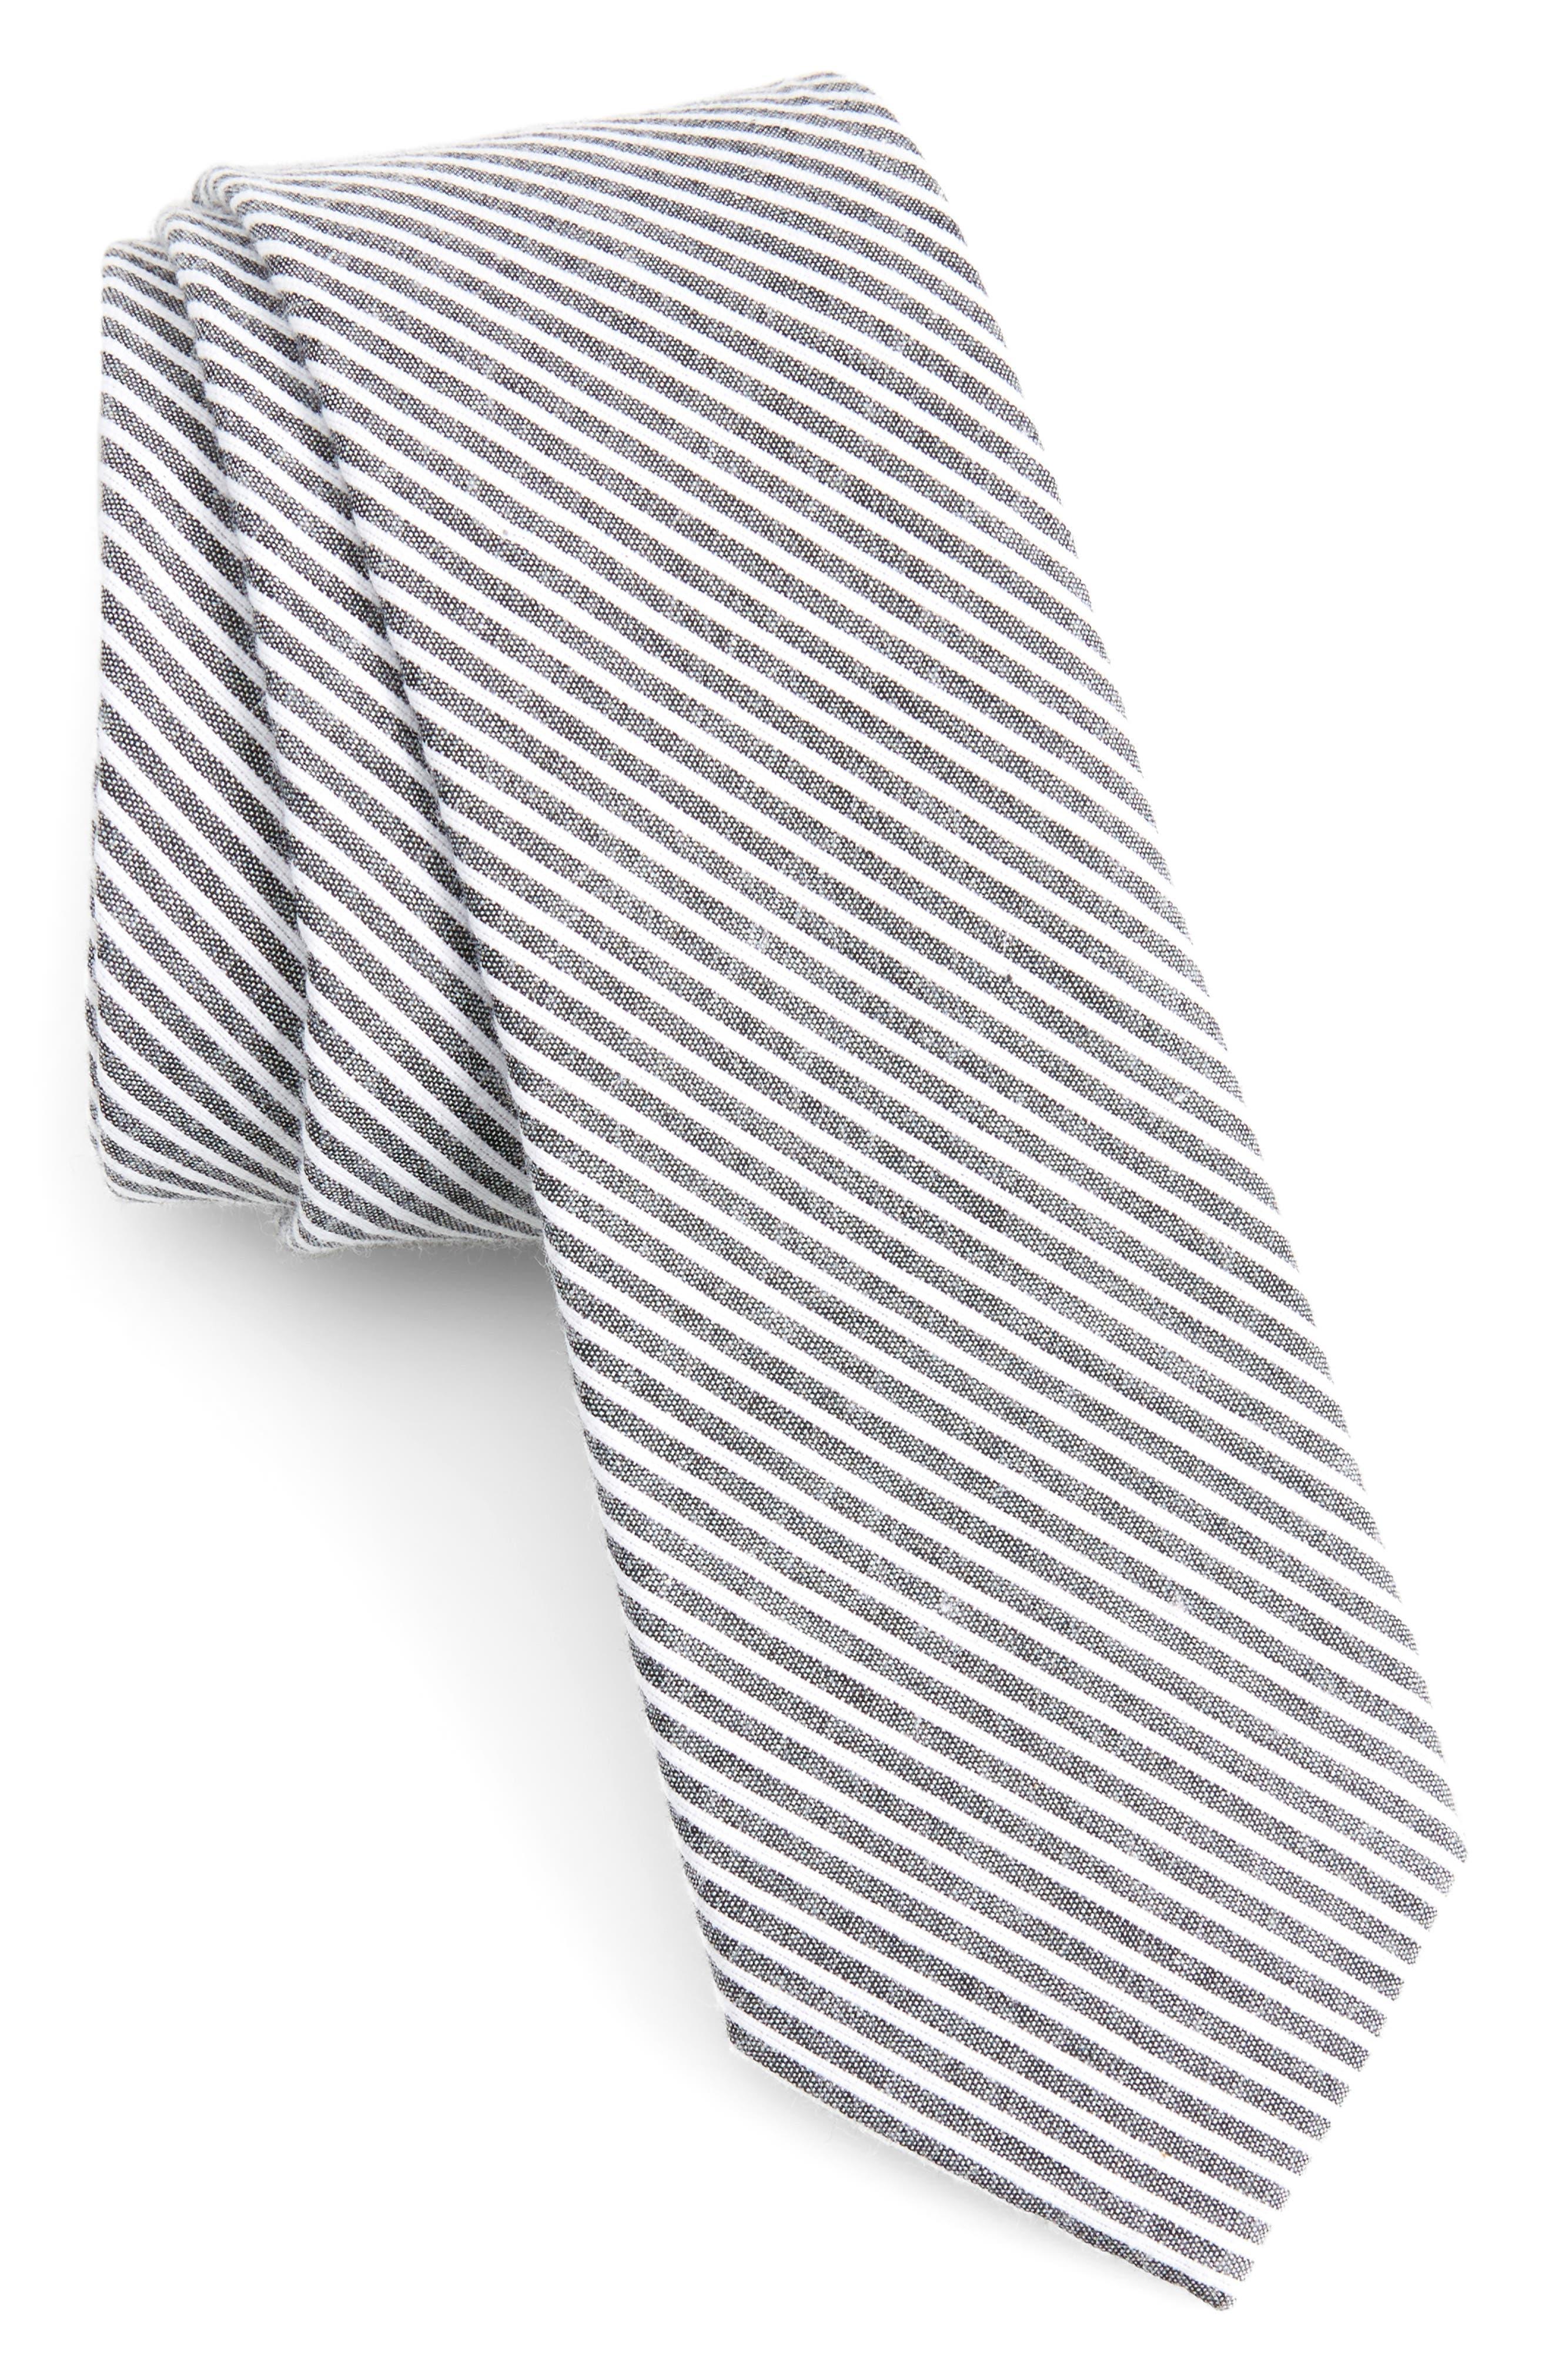 Kenton Stripe Cotton Tie,                             Main thumbnail 1, color,                             001